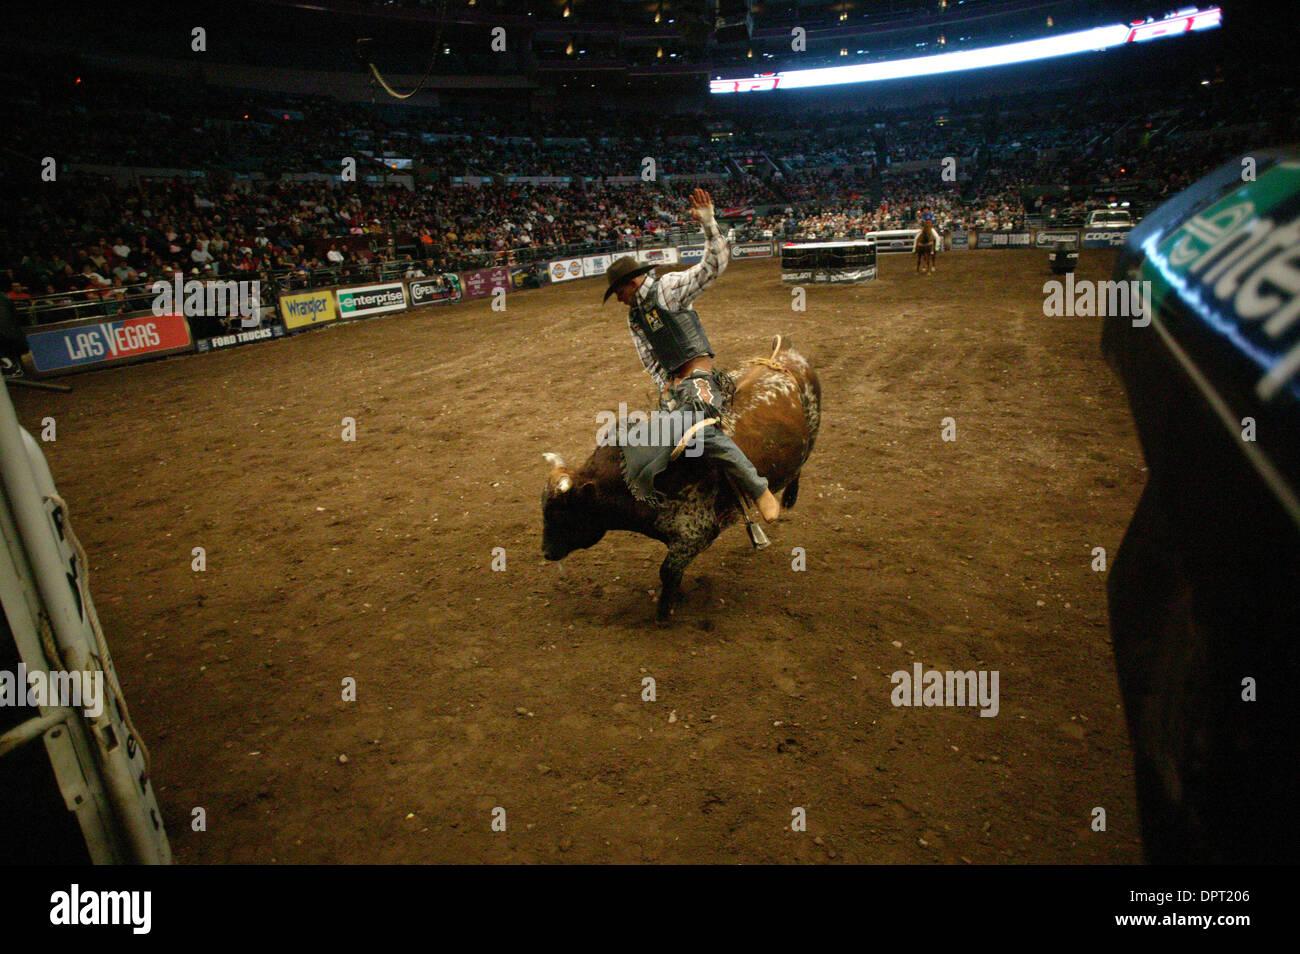 Professional bull riders stock photos professional bull - Bull riding madison square garden ...